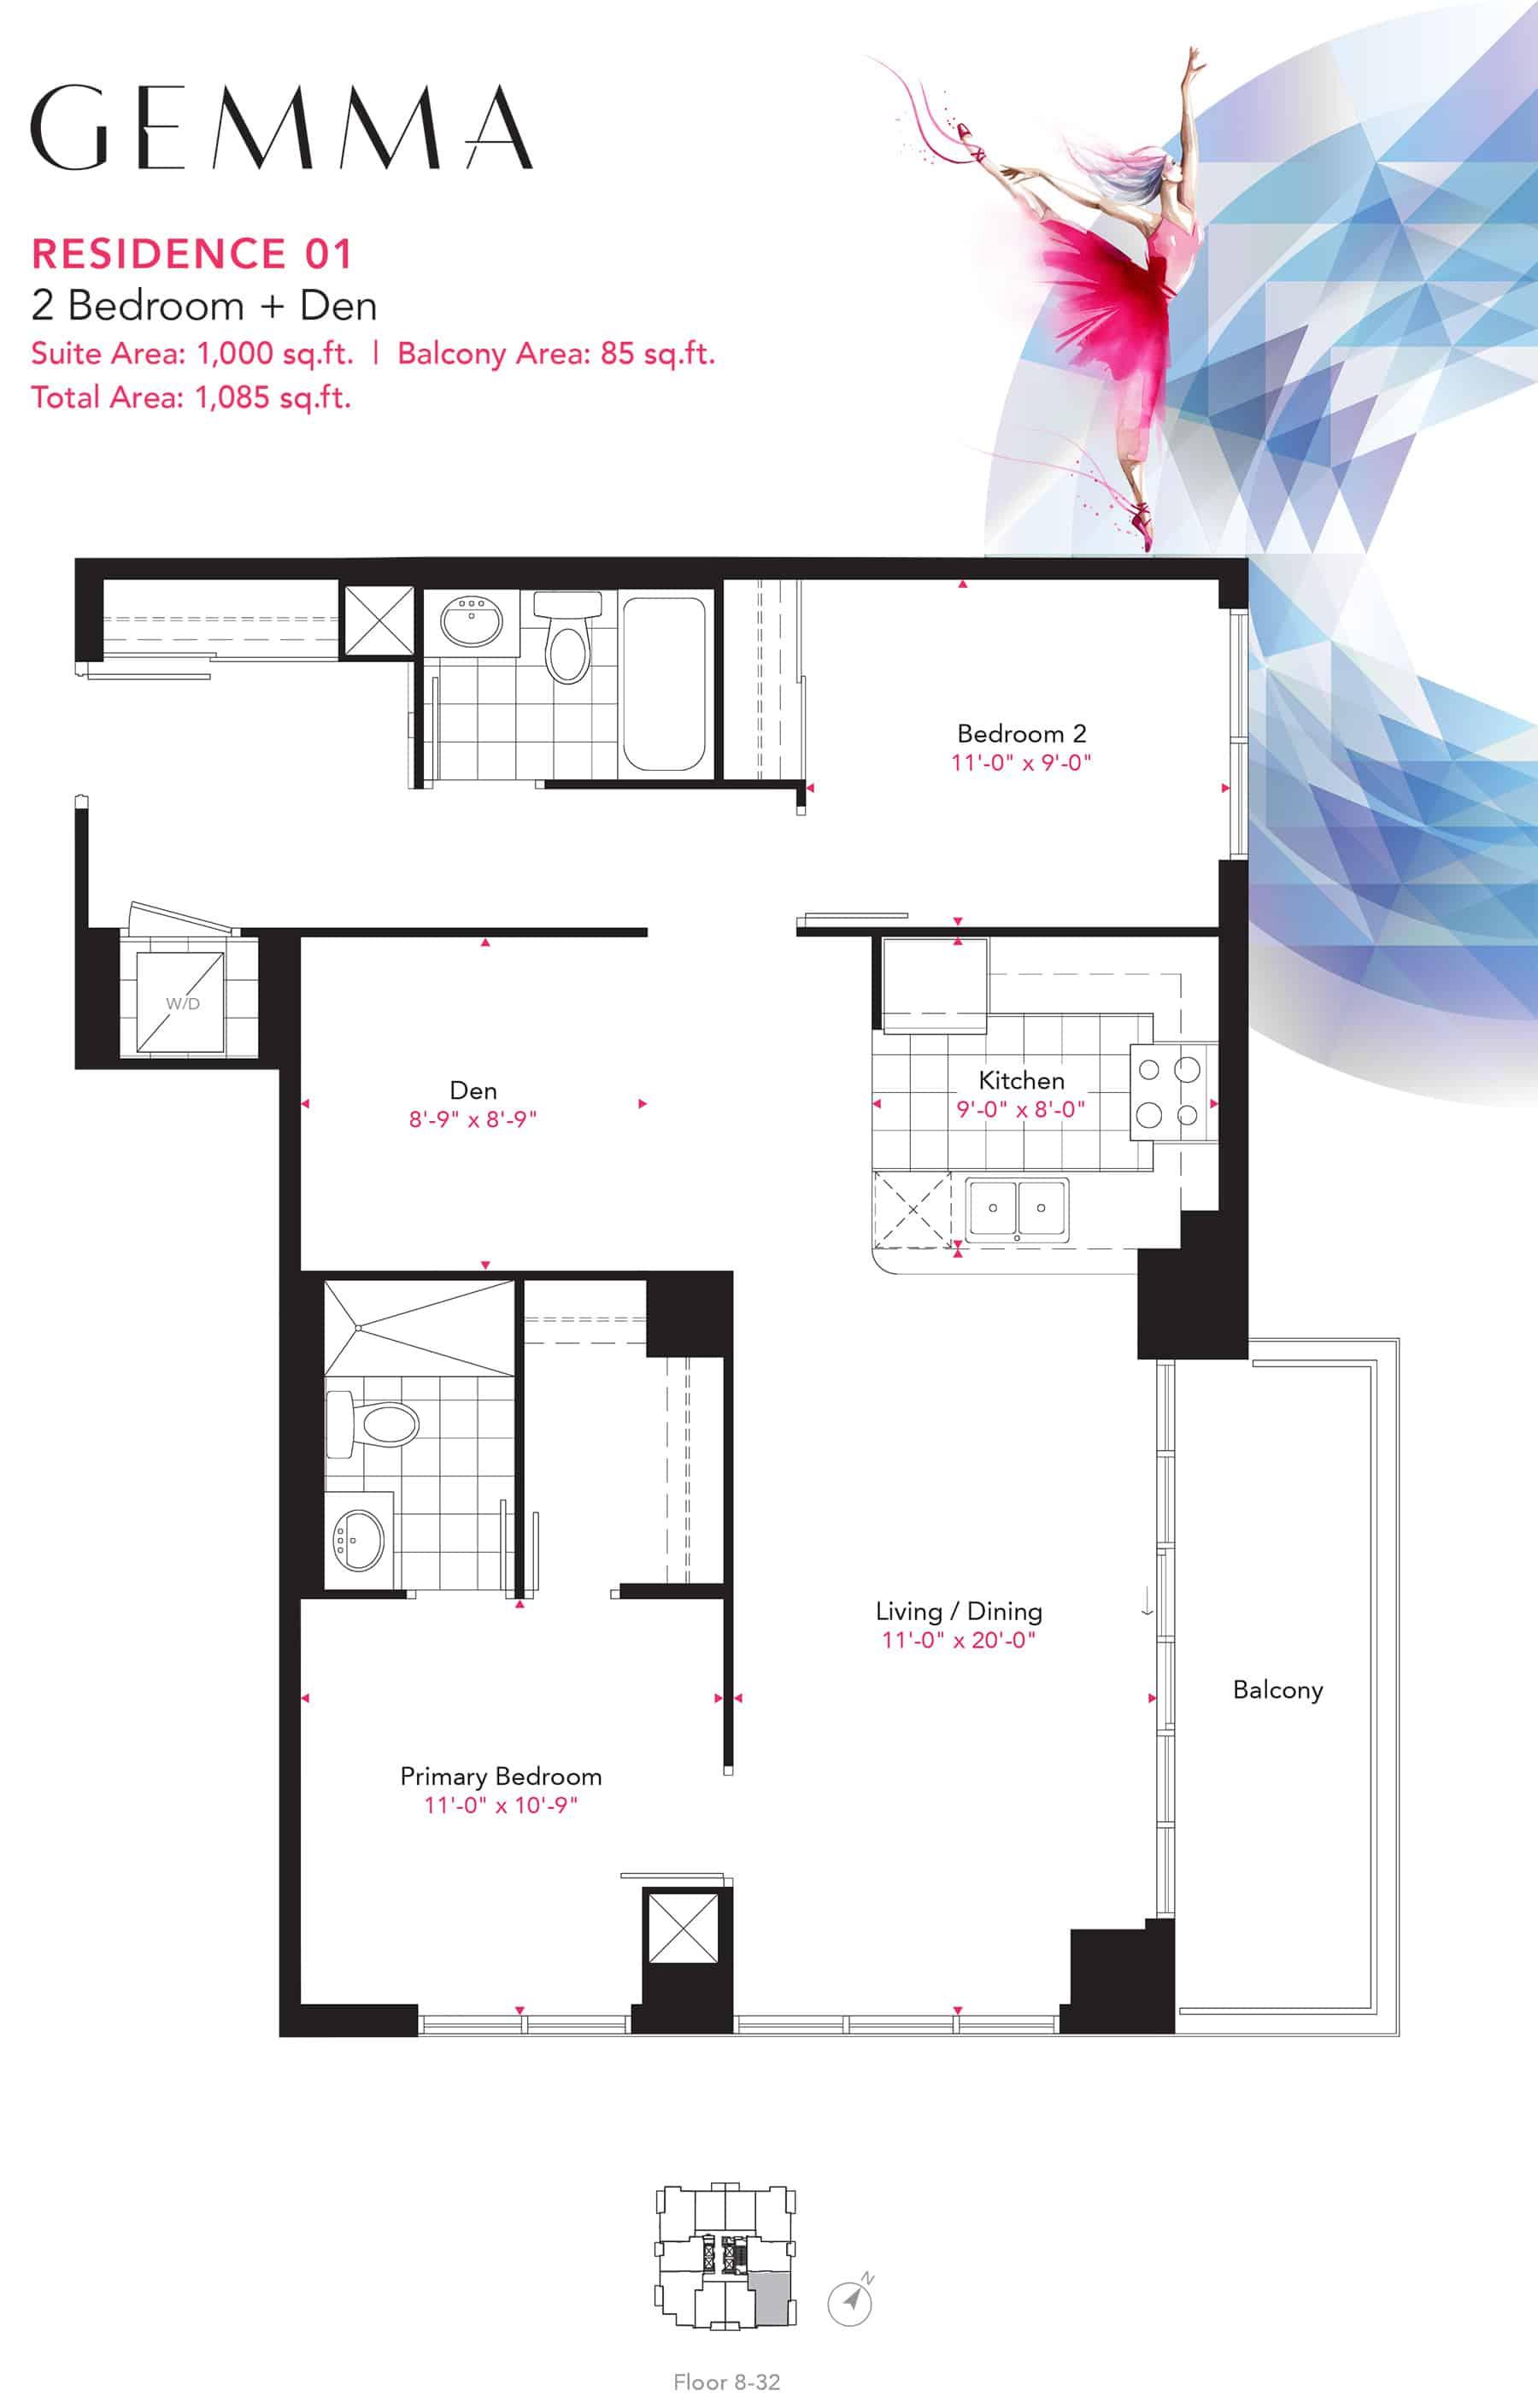 Residence-01-2B+D-1000-Sqft-Gemma  Gemma Condos Residence 01 2BD 1000 Sqft Gemma